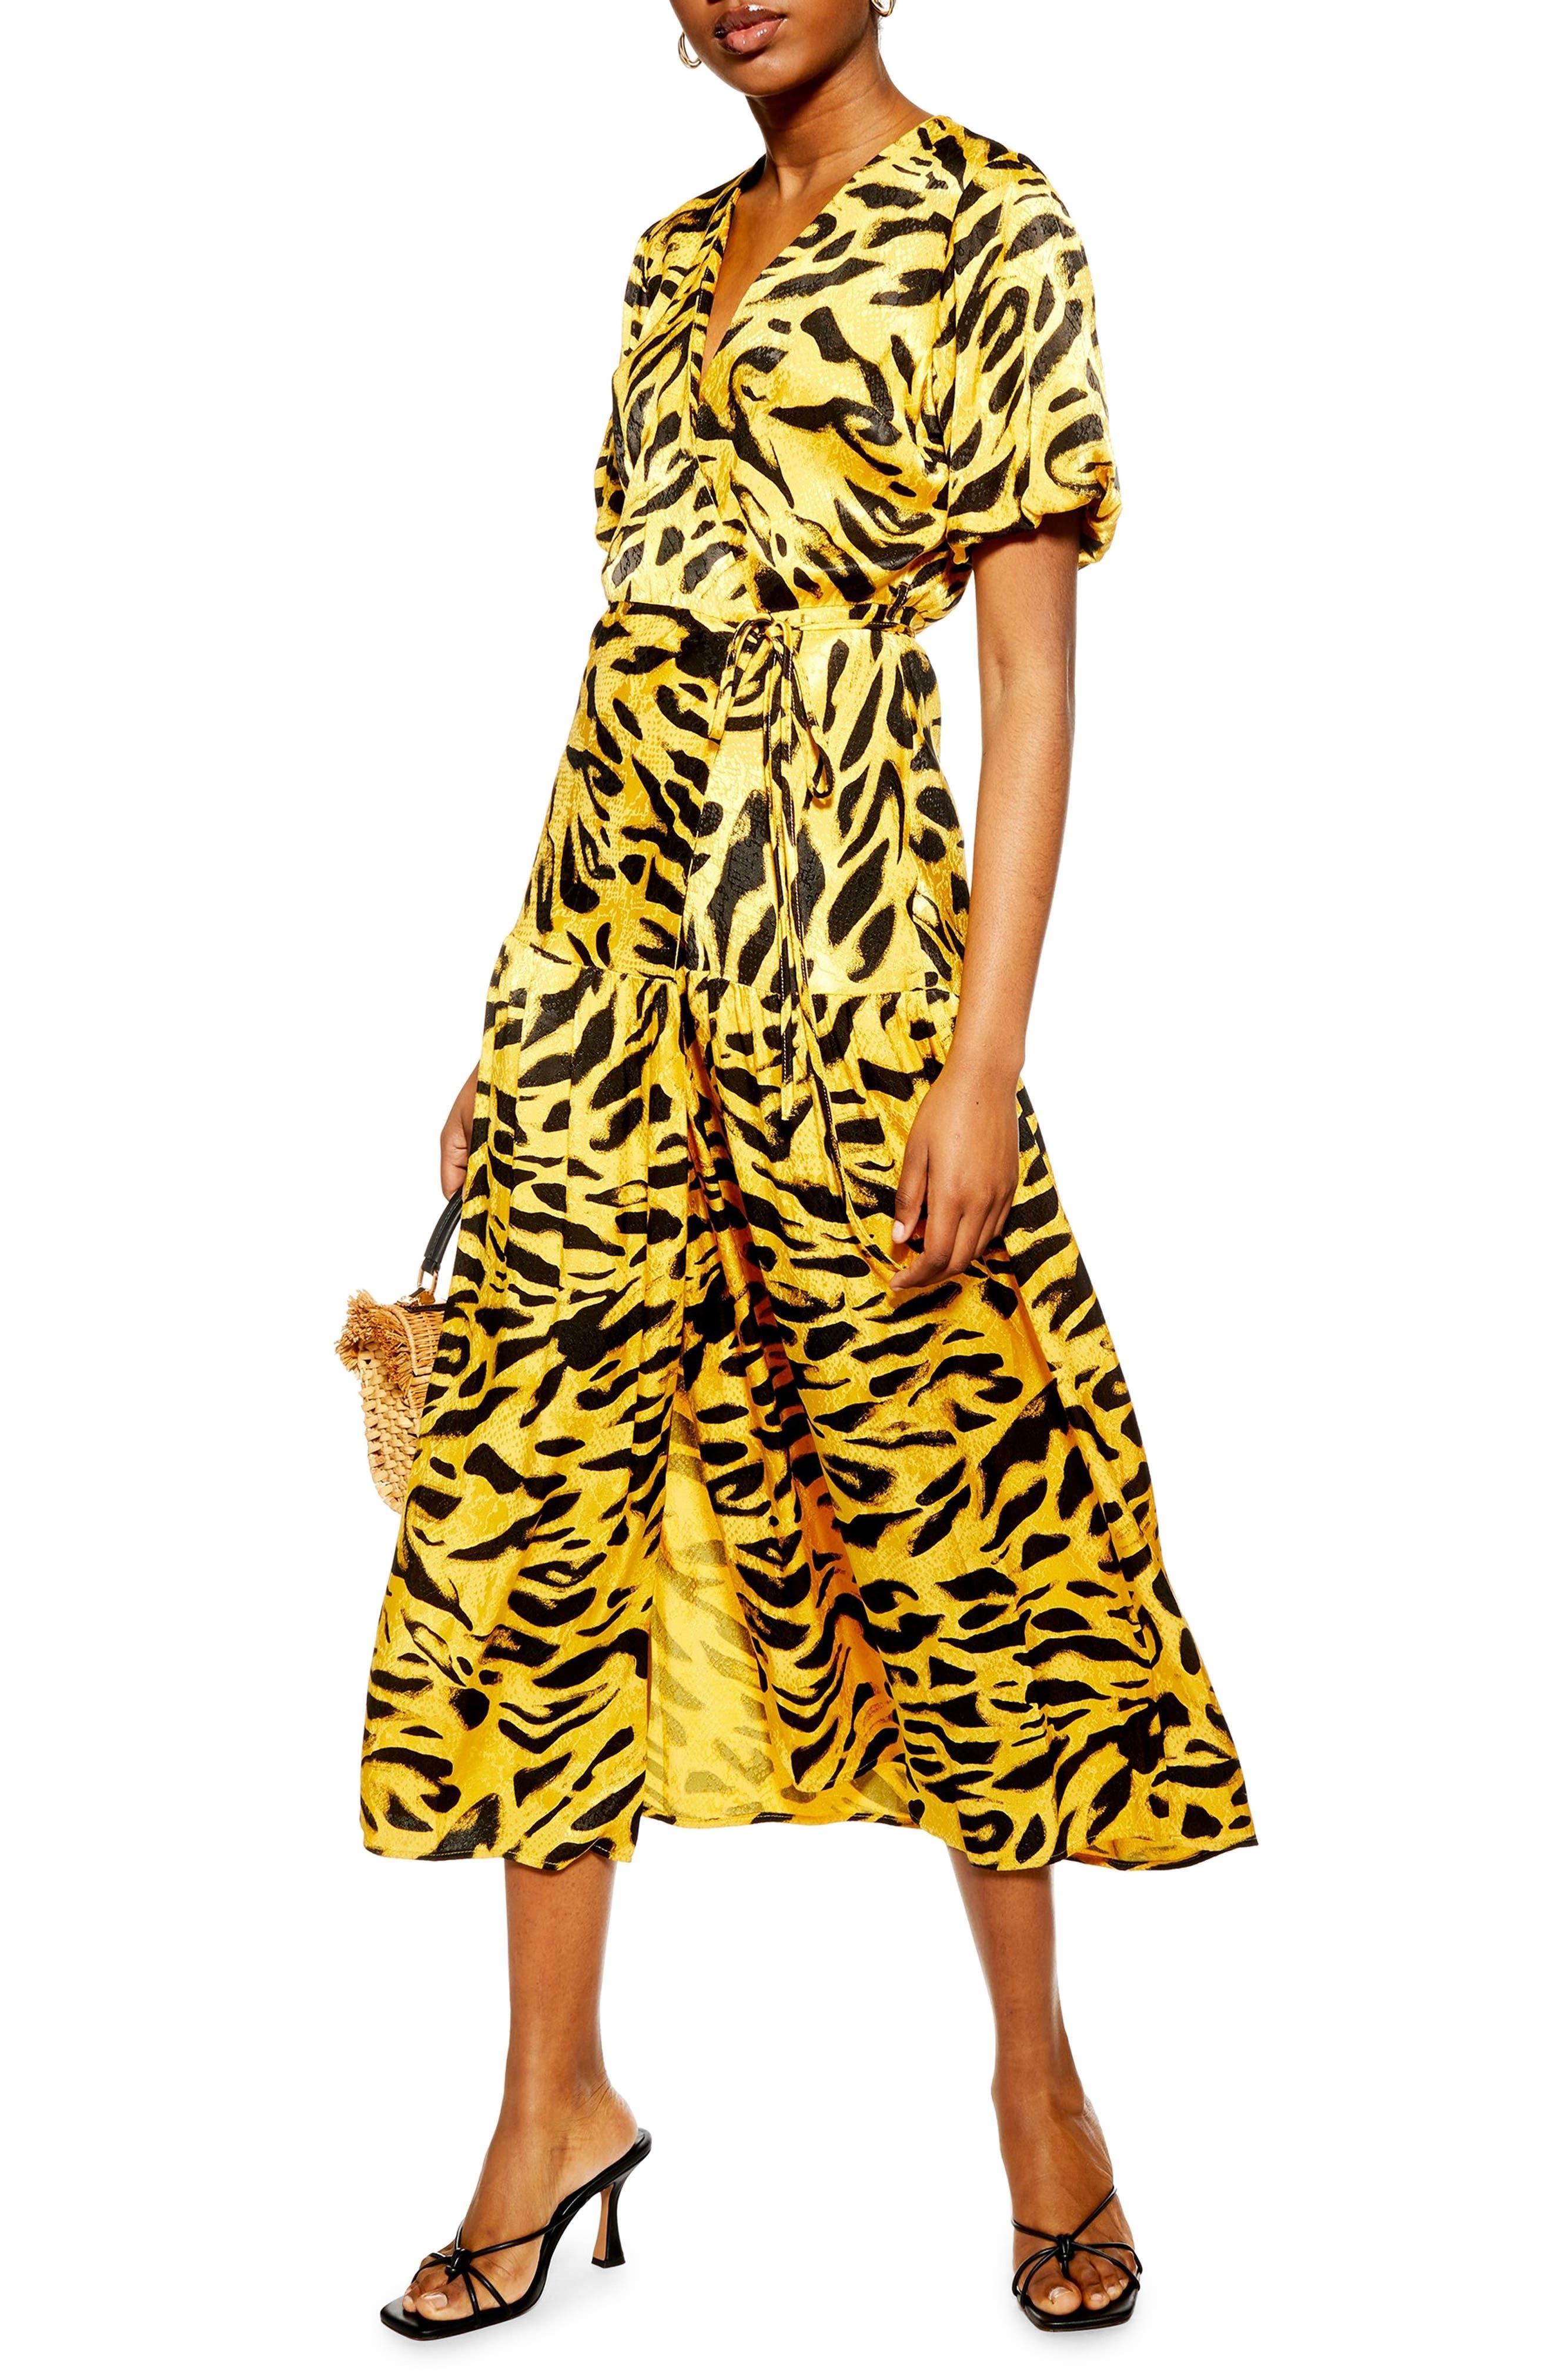 Topshop Jacquard Wrap Dress, US (fits like 2-4) - Yellow